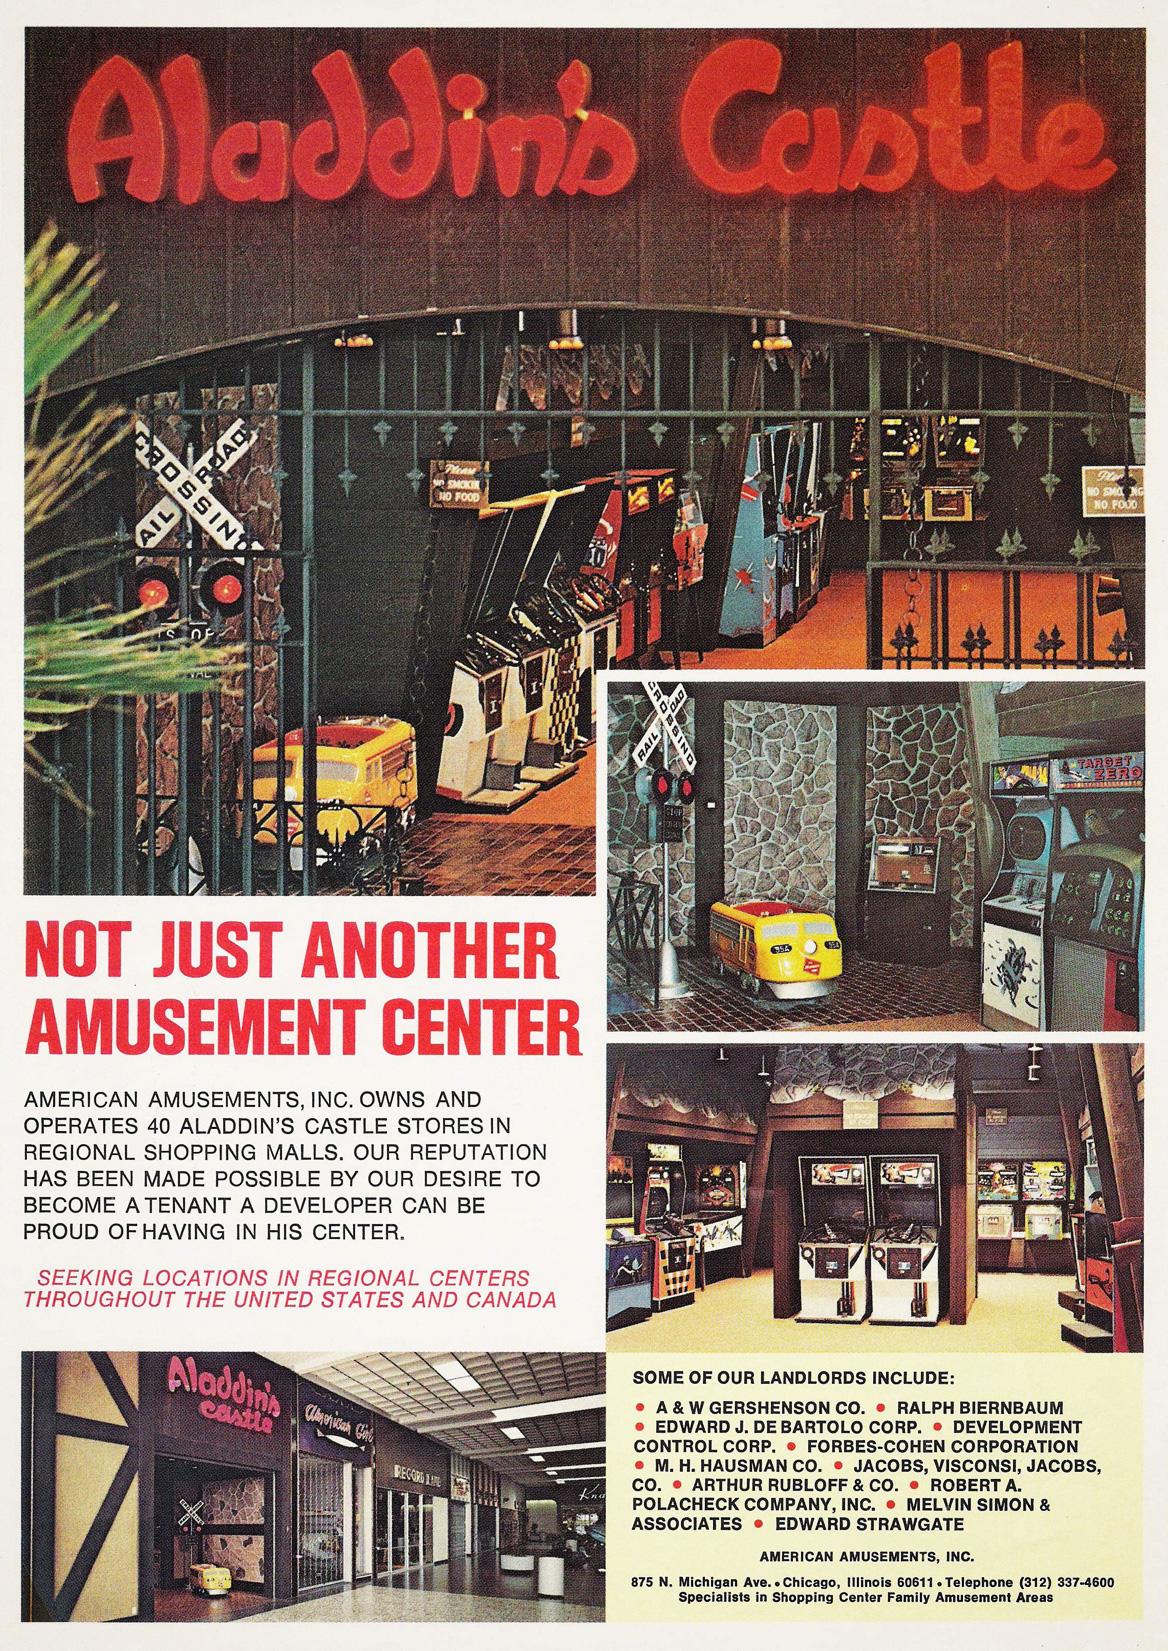 American Amusements Aladdins Castle Advert